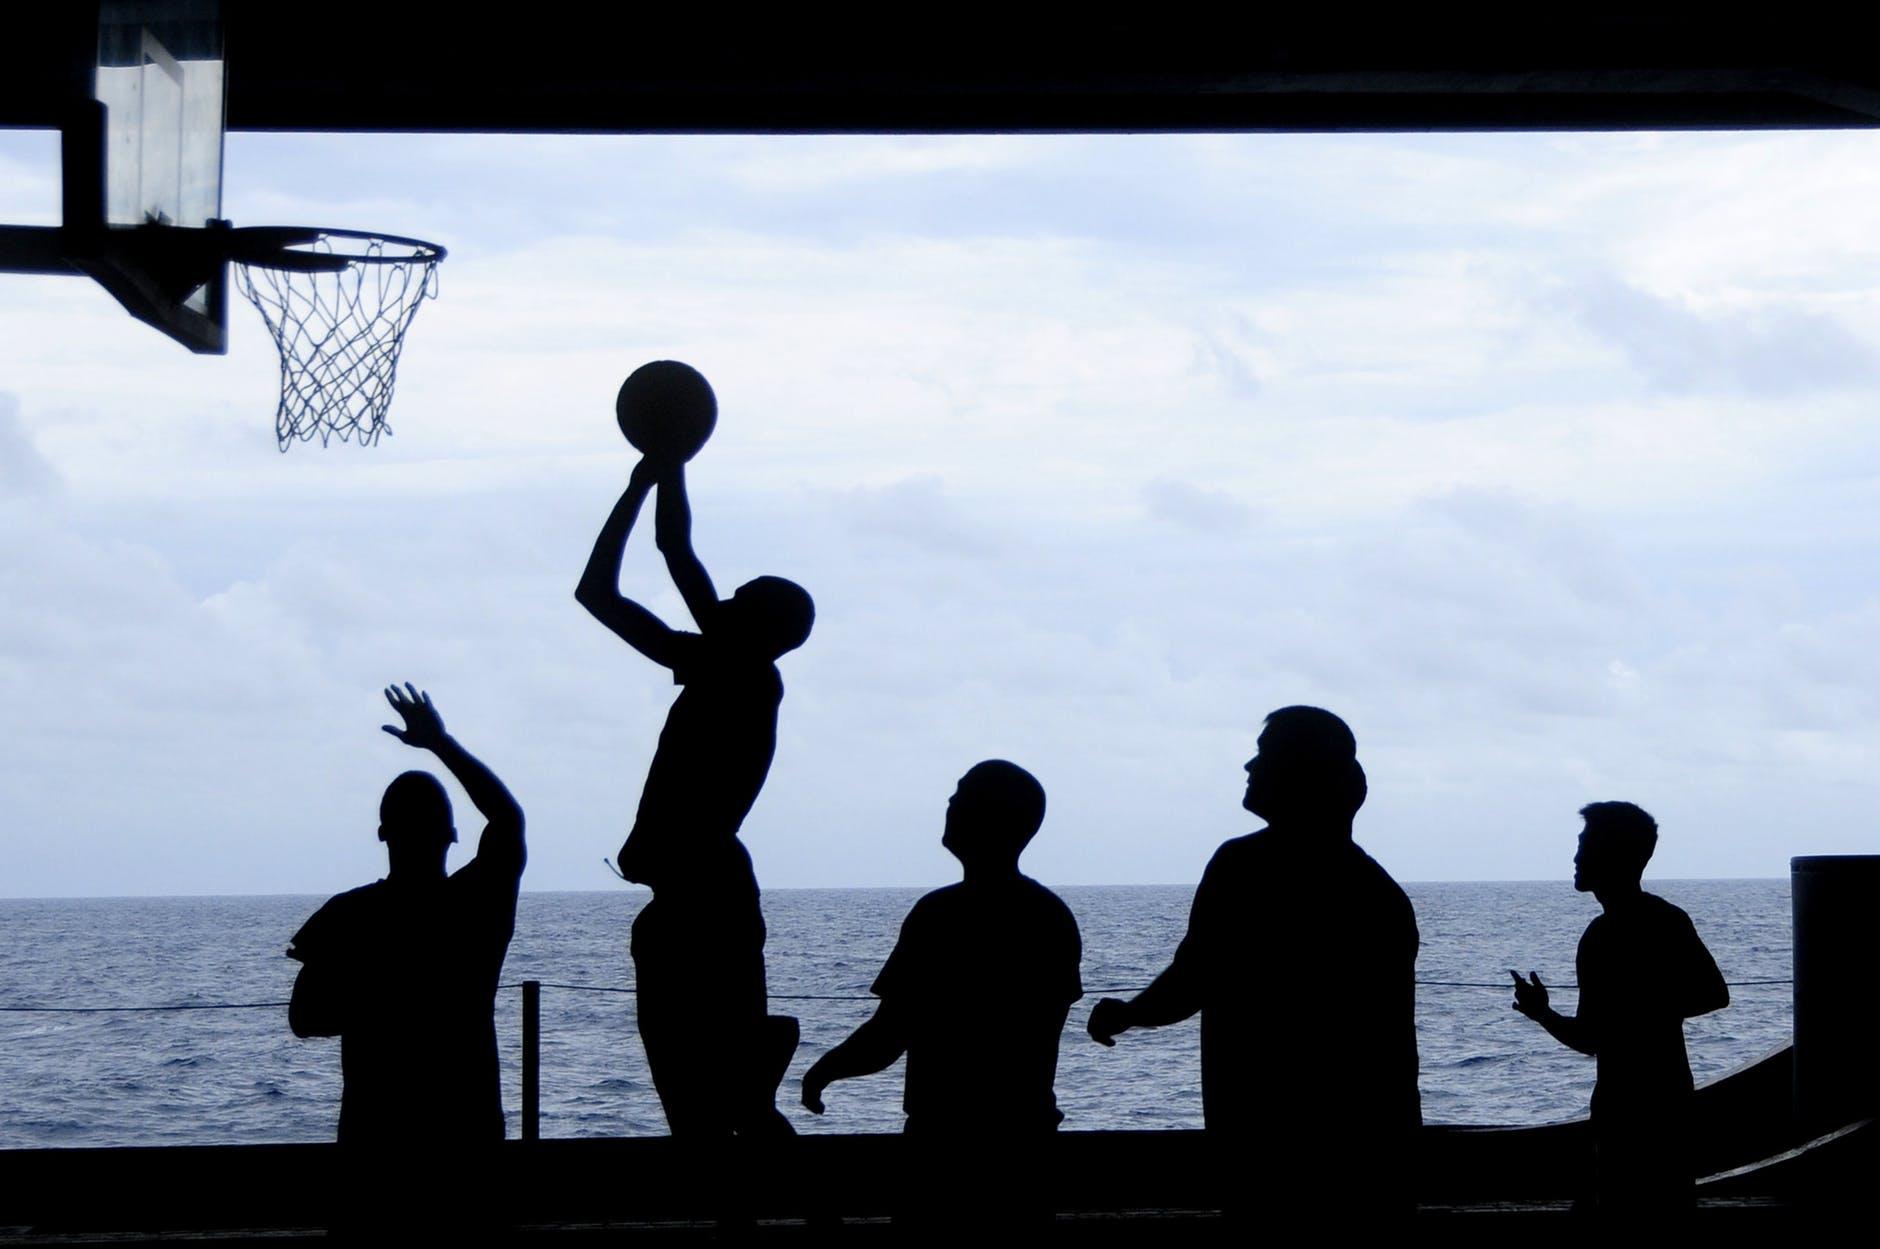 uss-nimitz-basketball-silhouettes-sea-69773.jpg